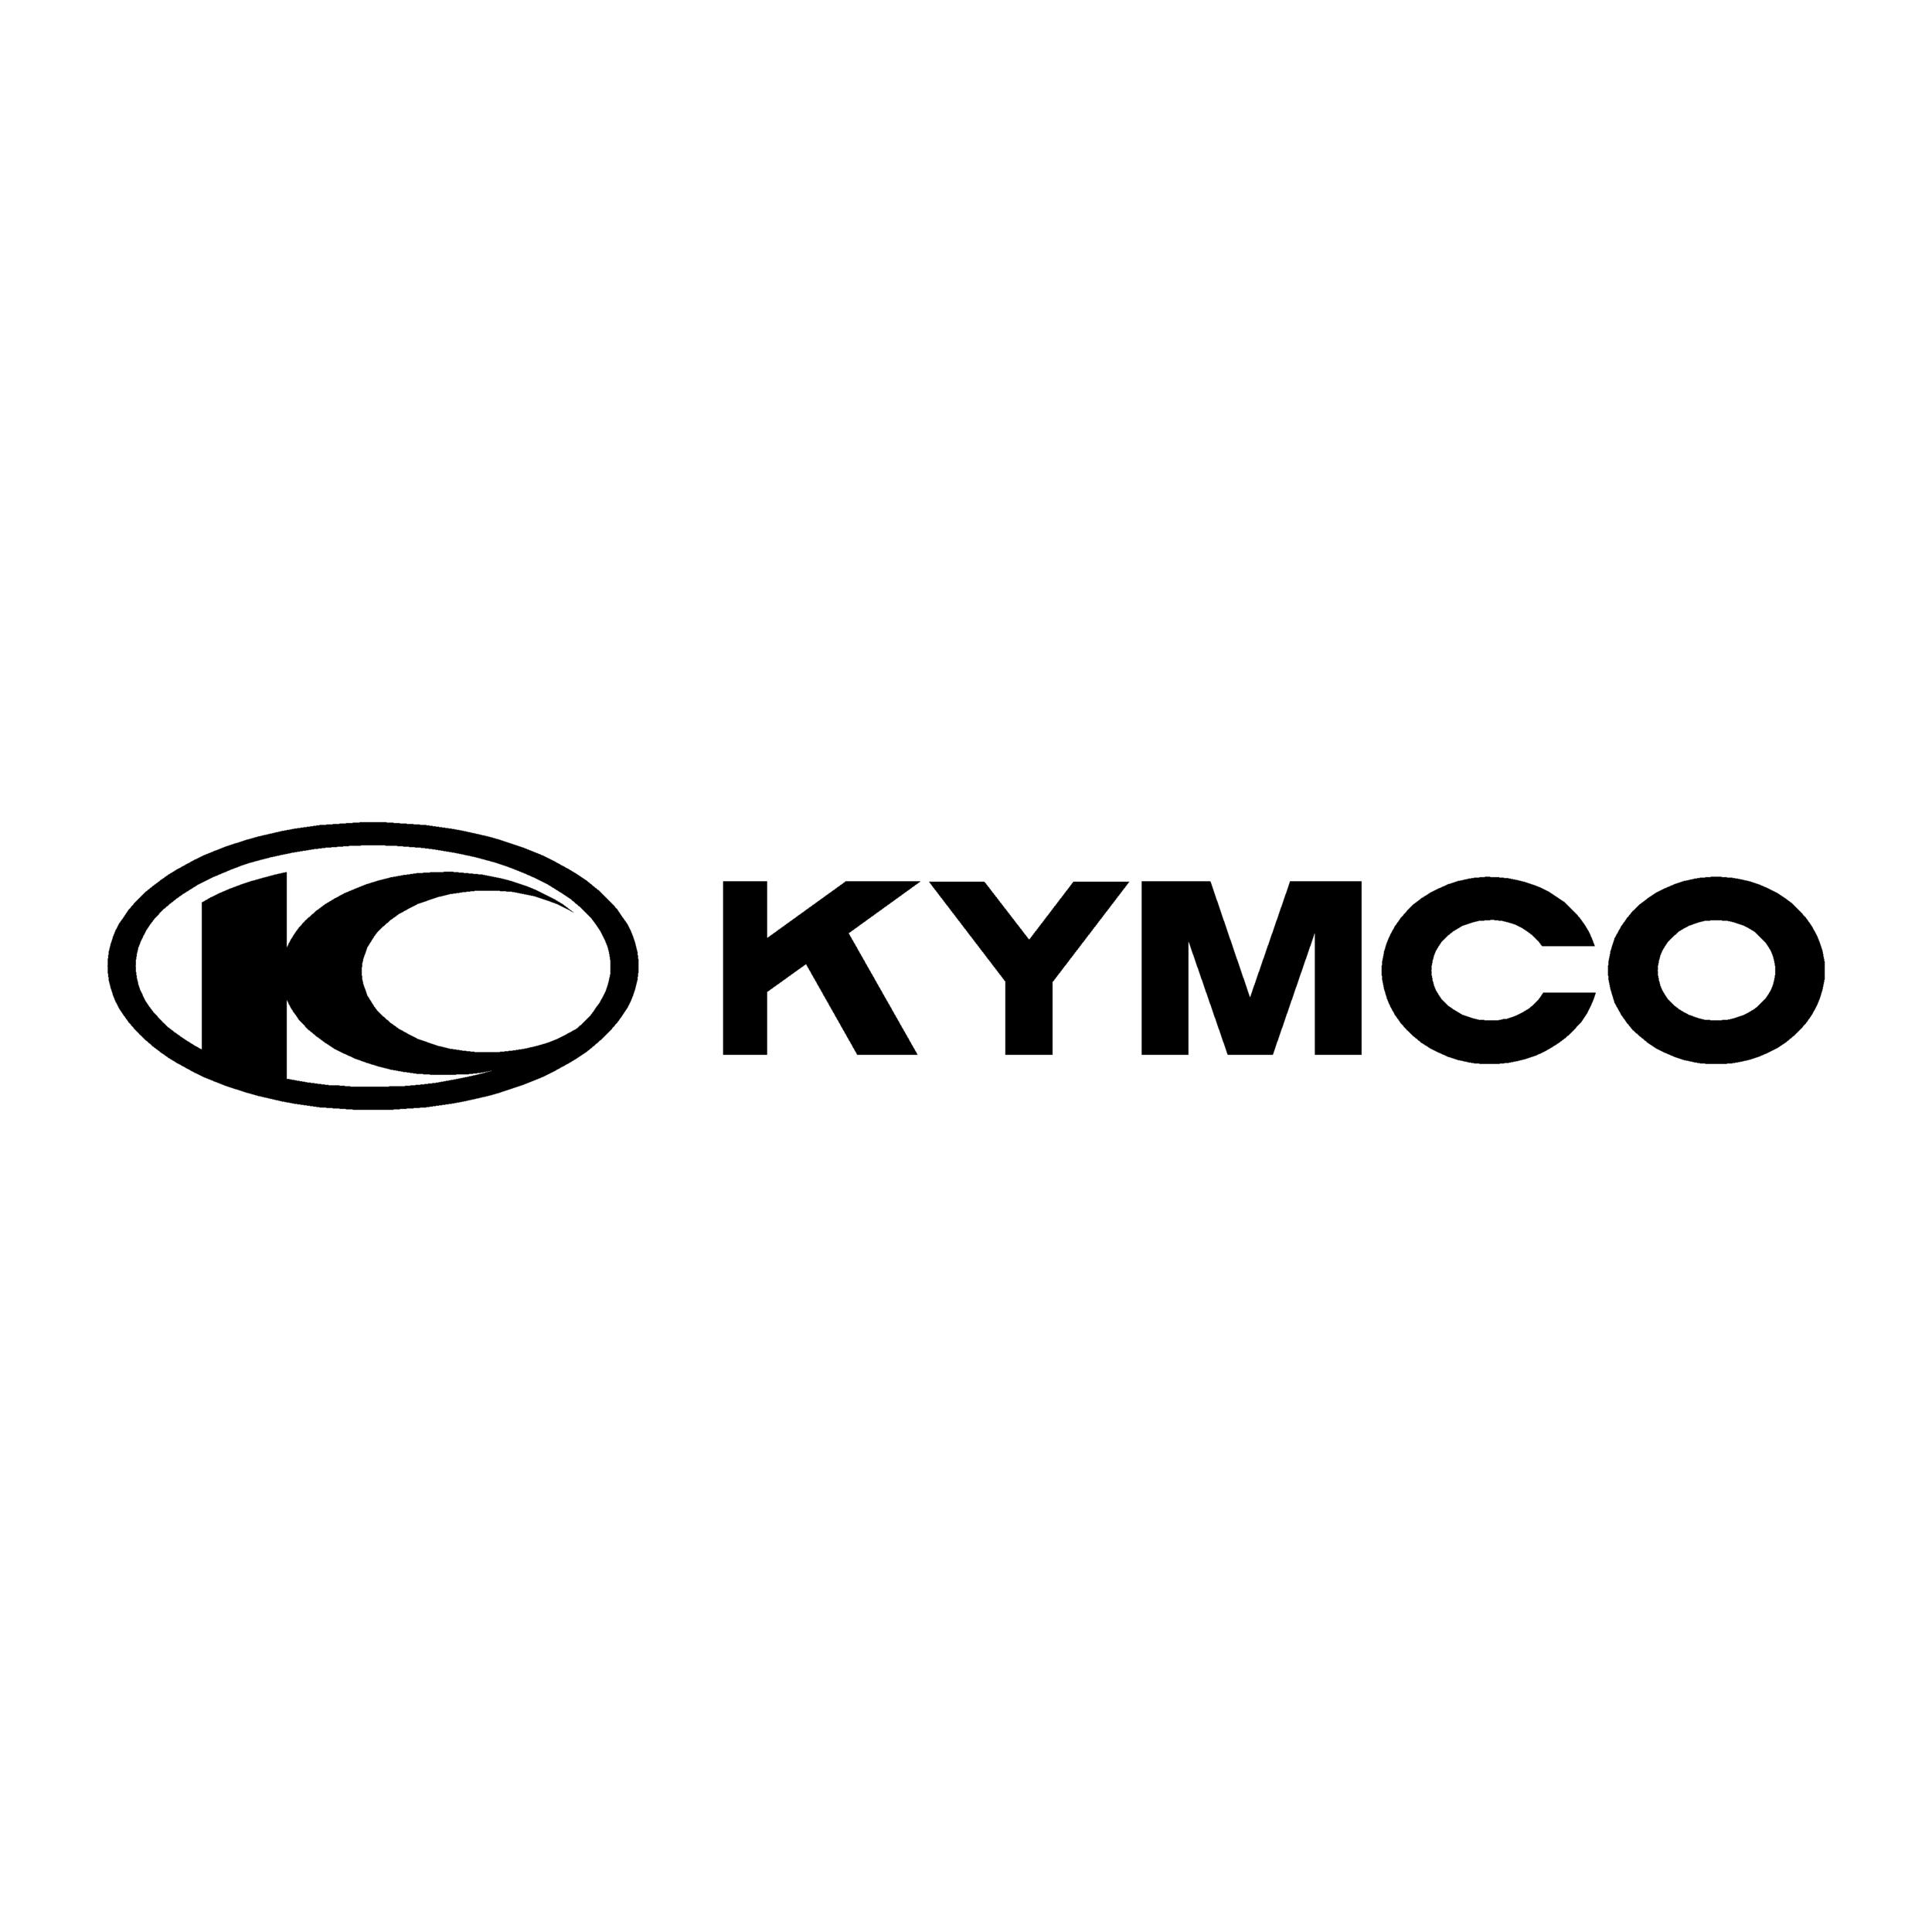 sticker kymco ref 1 tuning audio sonorisation car auto moto camion competition deco rallye autocollant